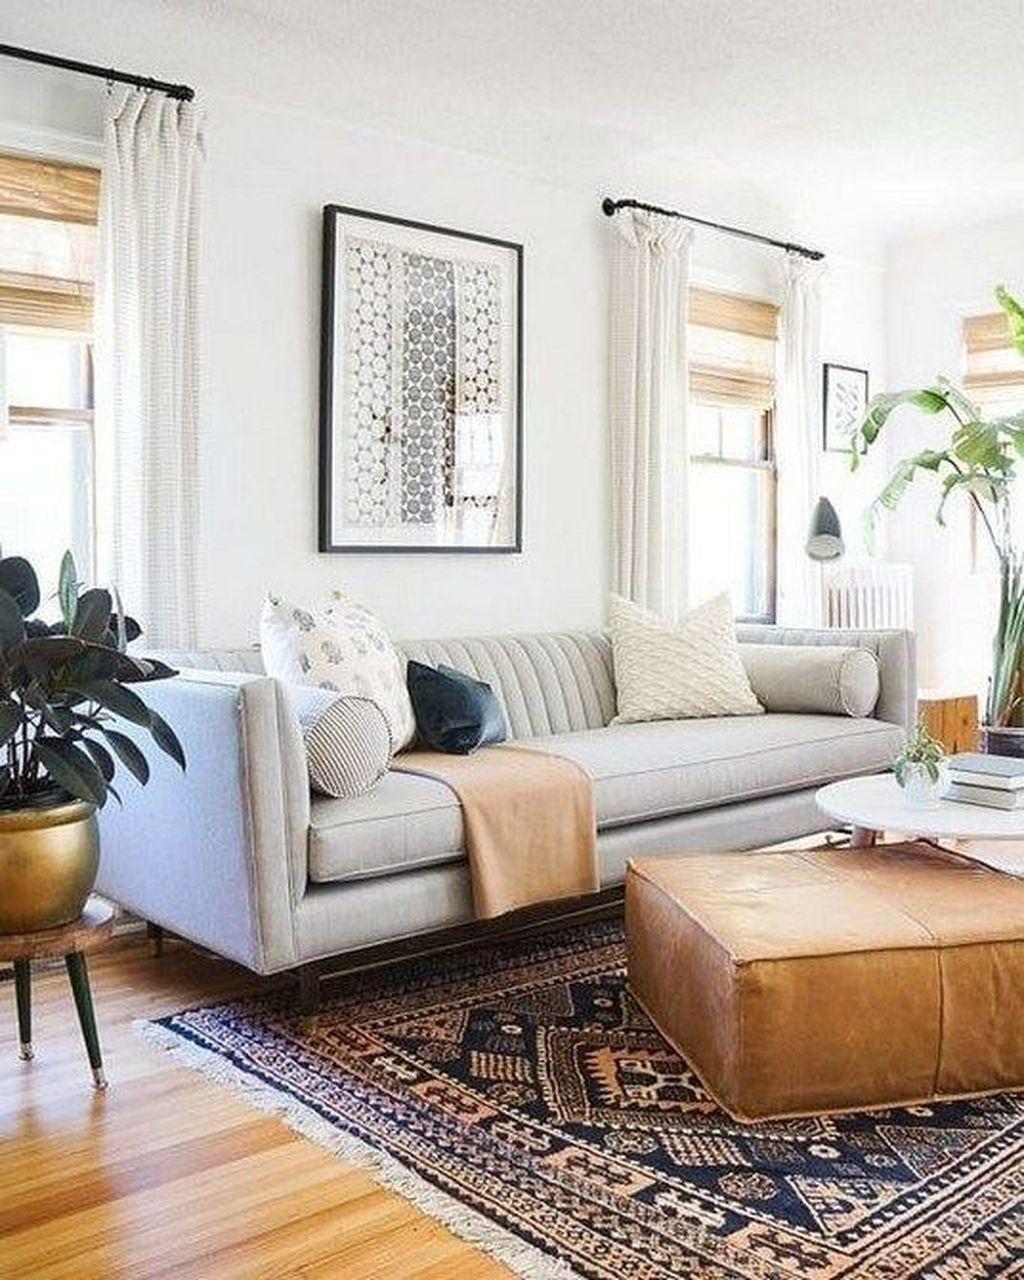 Excellent Furniture Design Ideas For Your Living Room 18